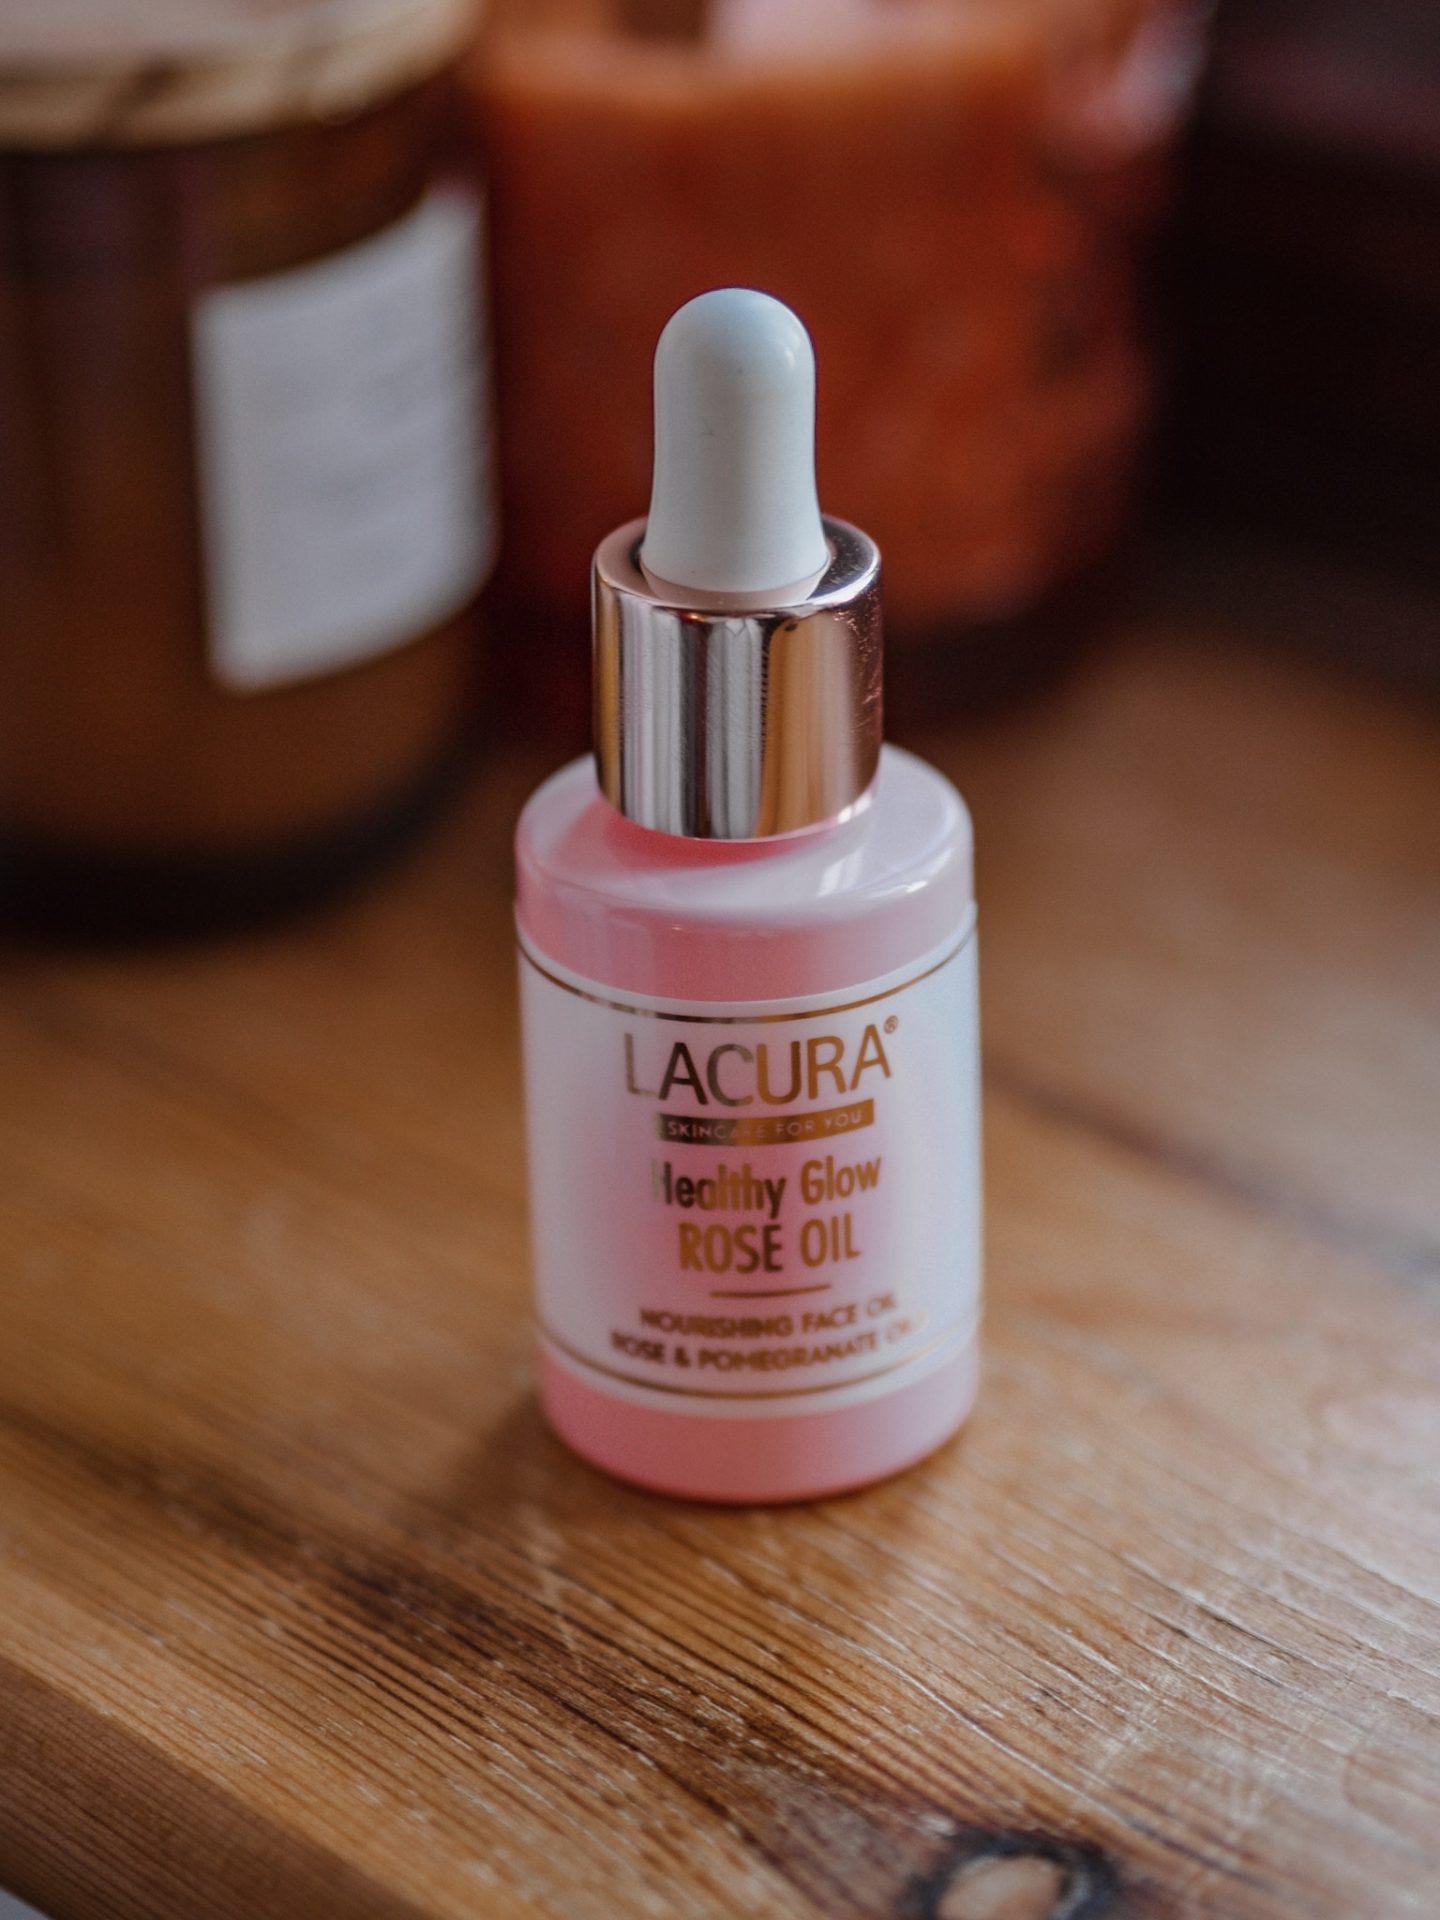 Aldi, Lacura Skincare, Aldi Face oil, Rose Face oil, Beauty Bloggers, Bargain beauty,